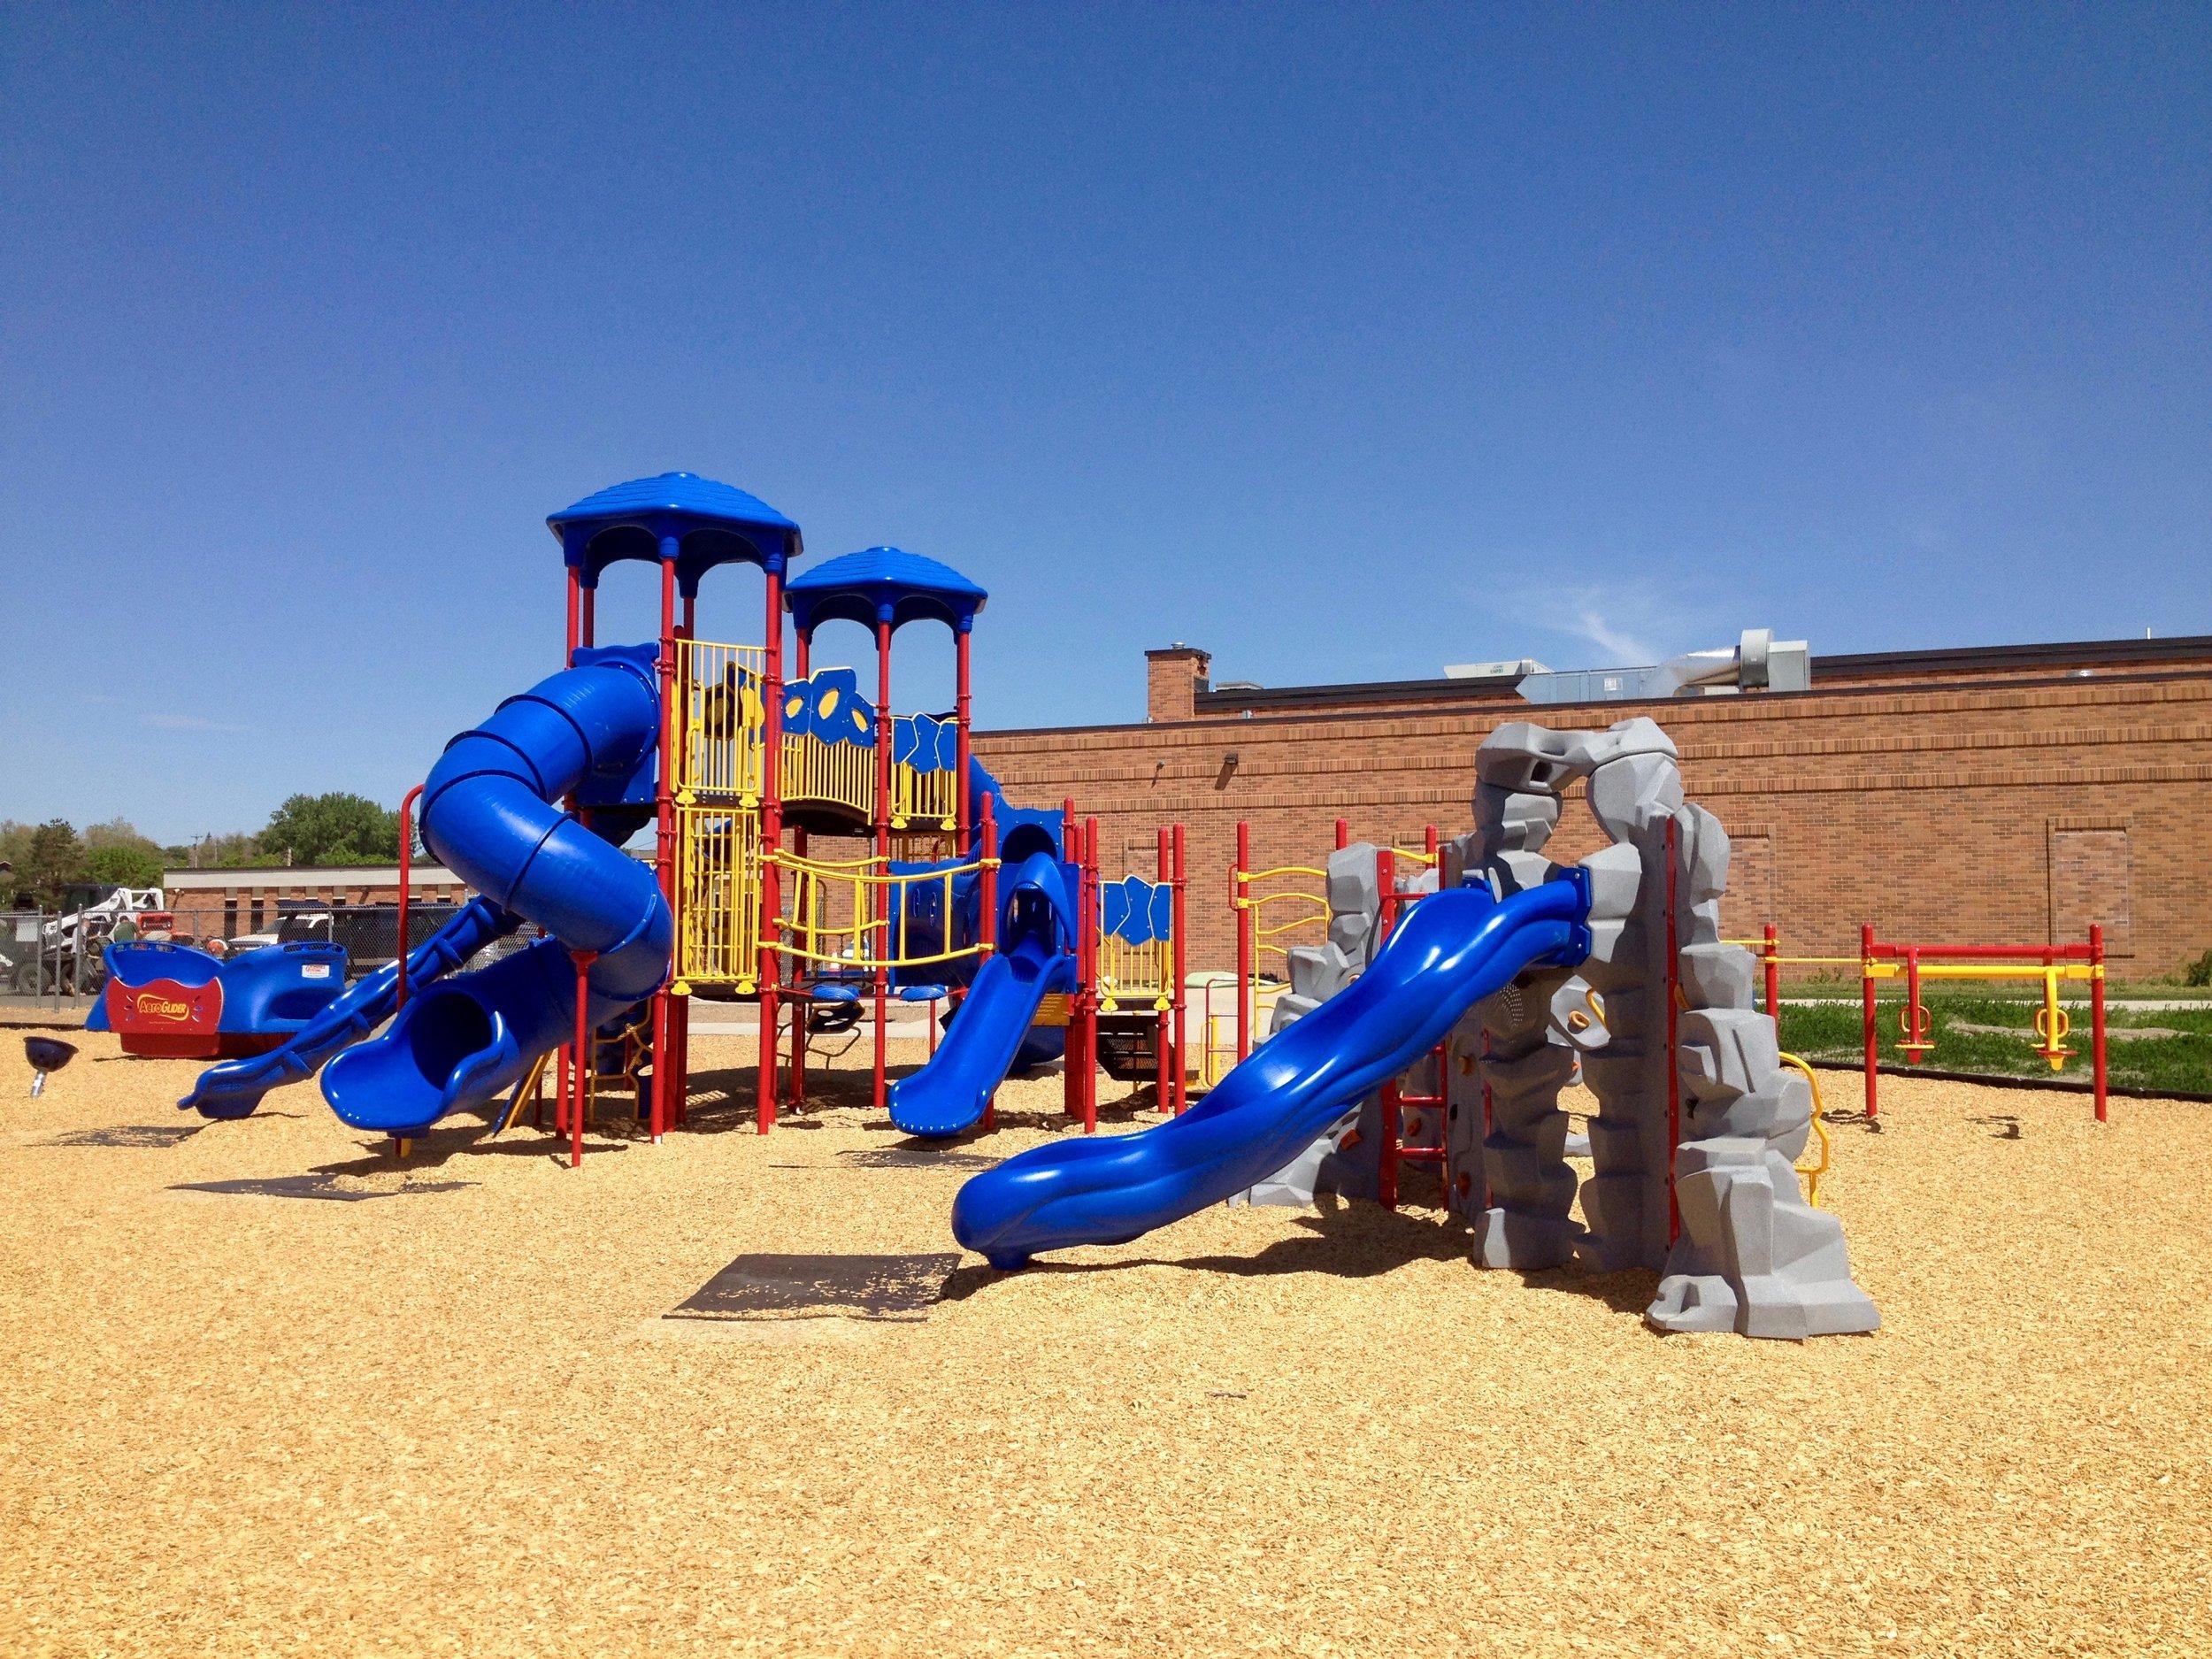 Watford City Elementary School, Watford City, ND